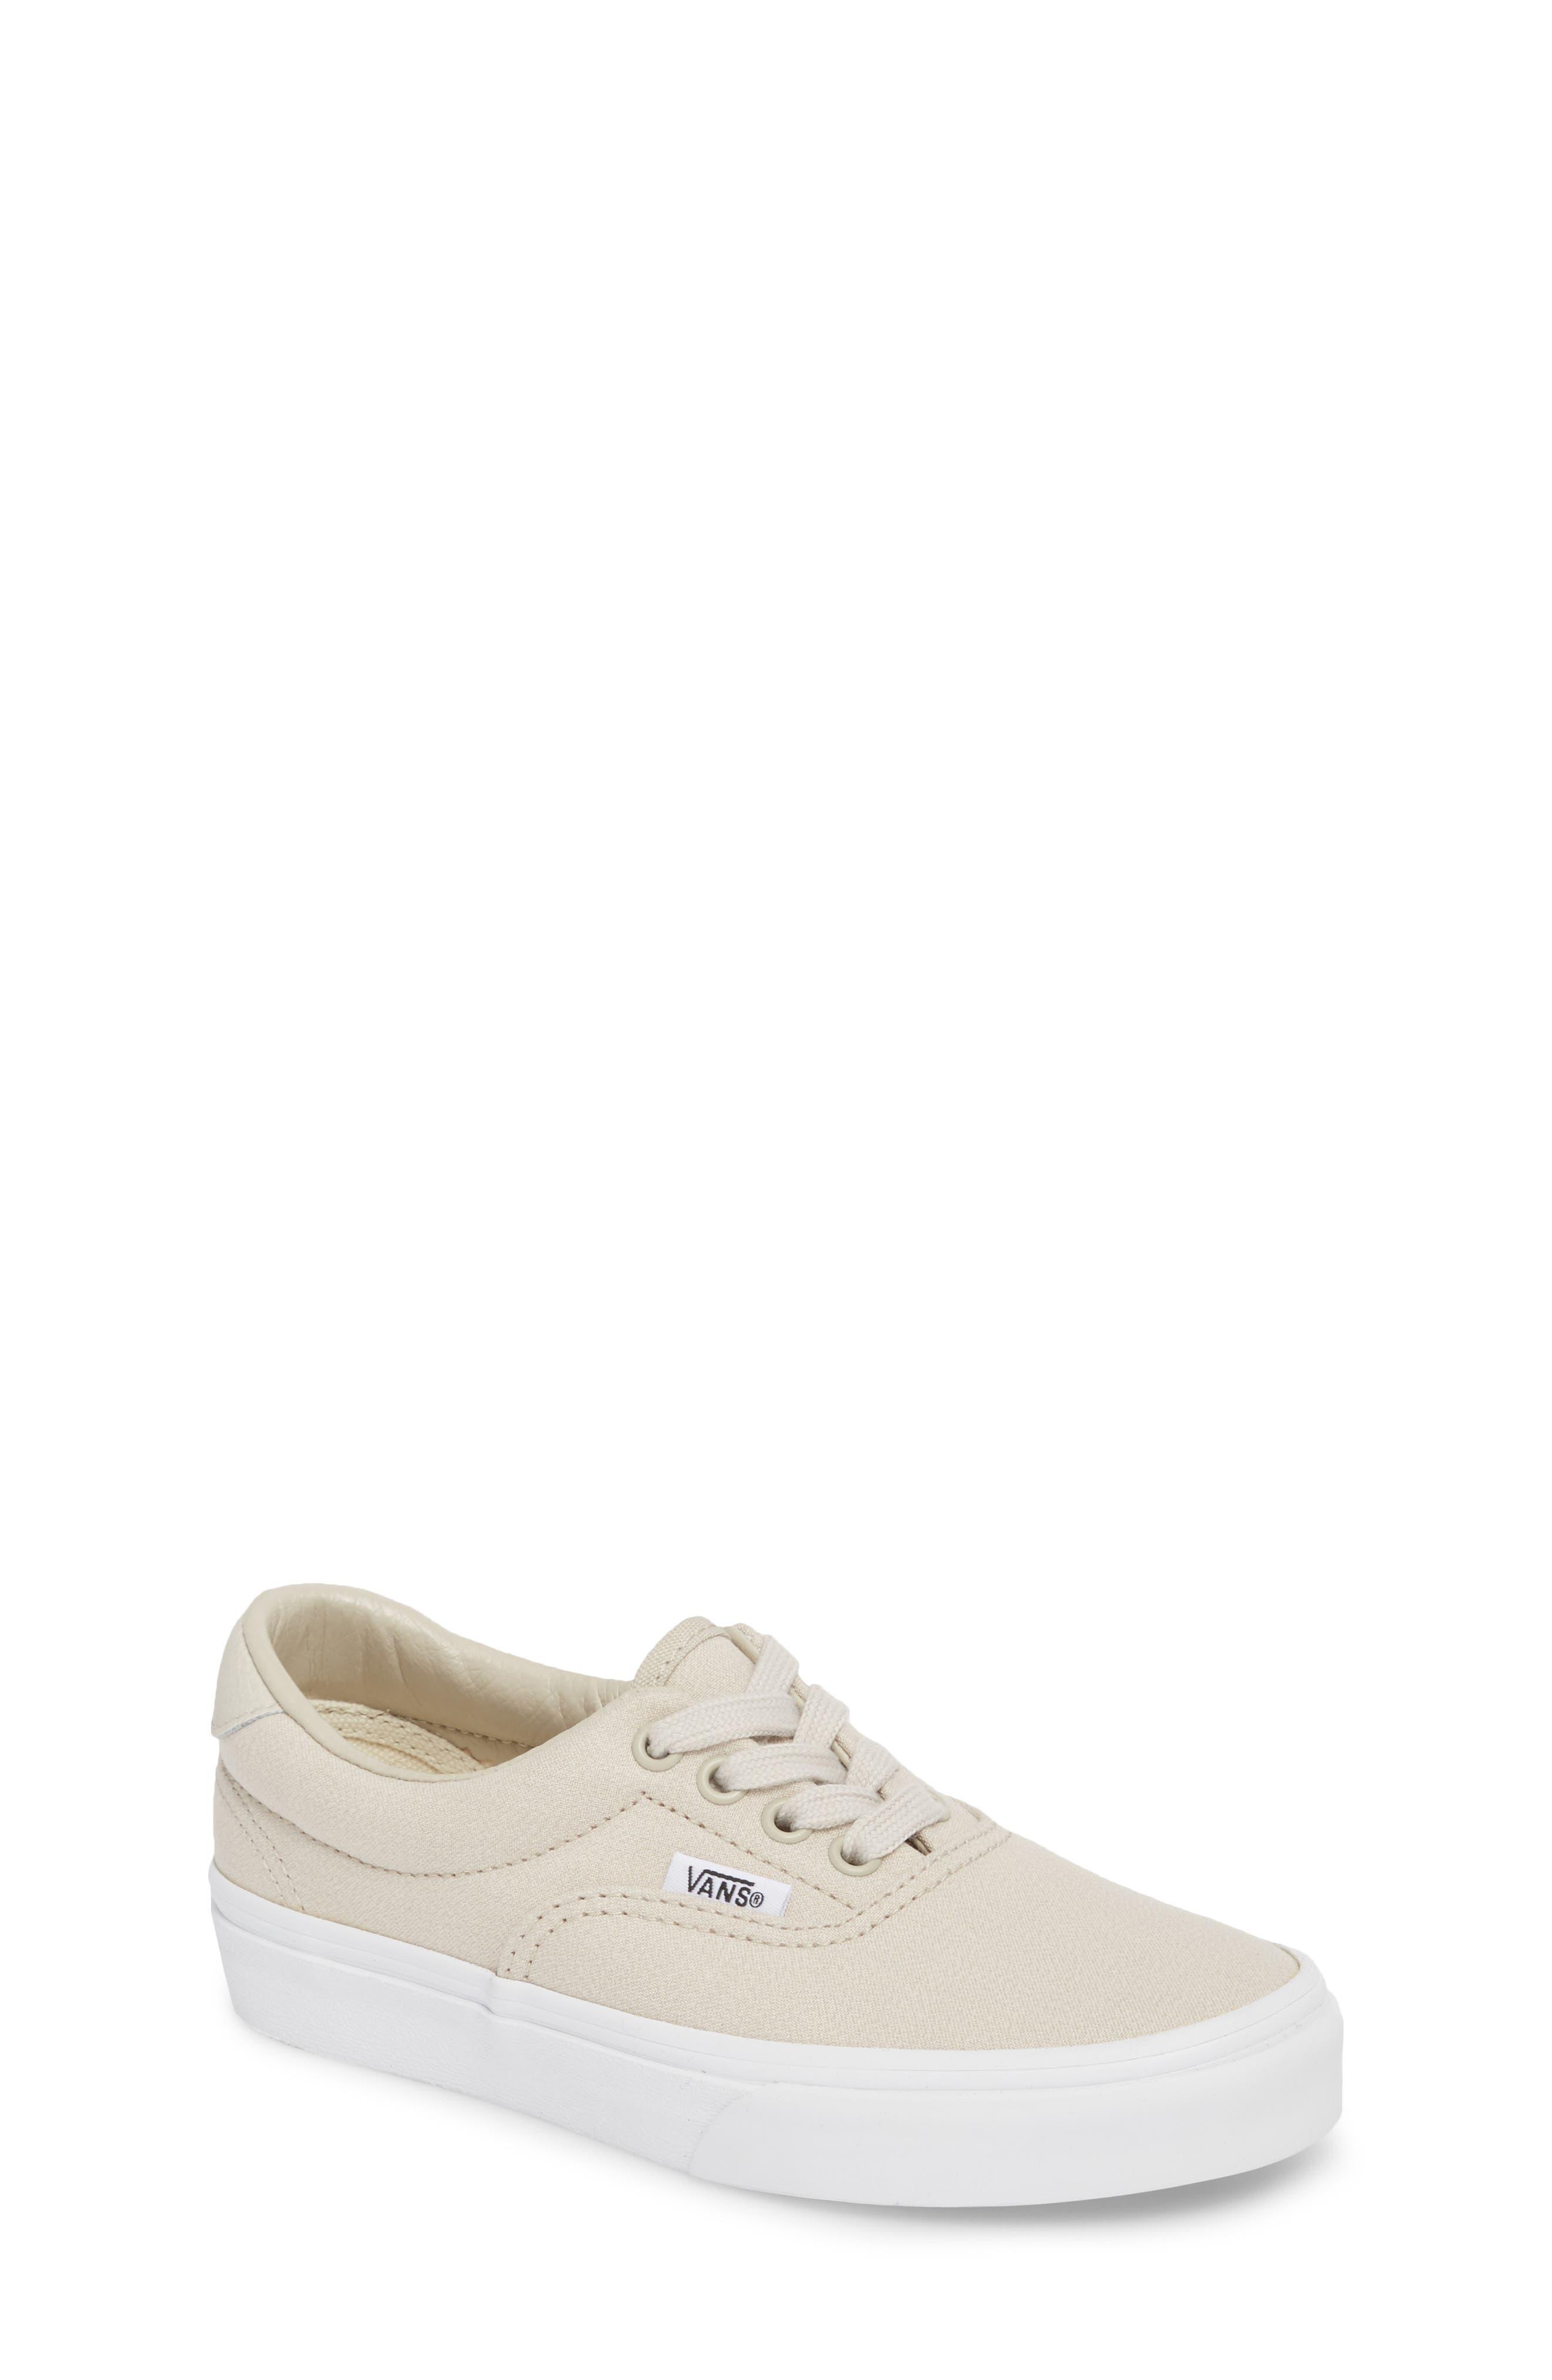 Era 59 Bleacher Sneaker,                         Main,                         color, Silver Lining/ True White